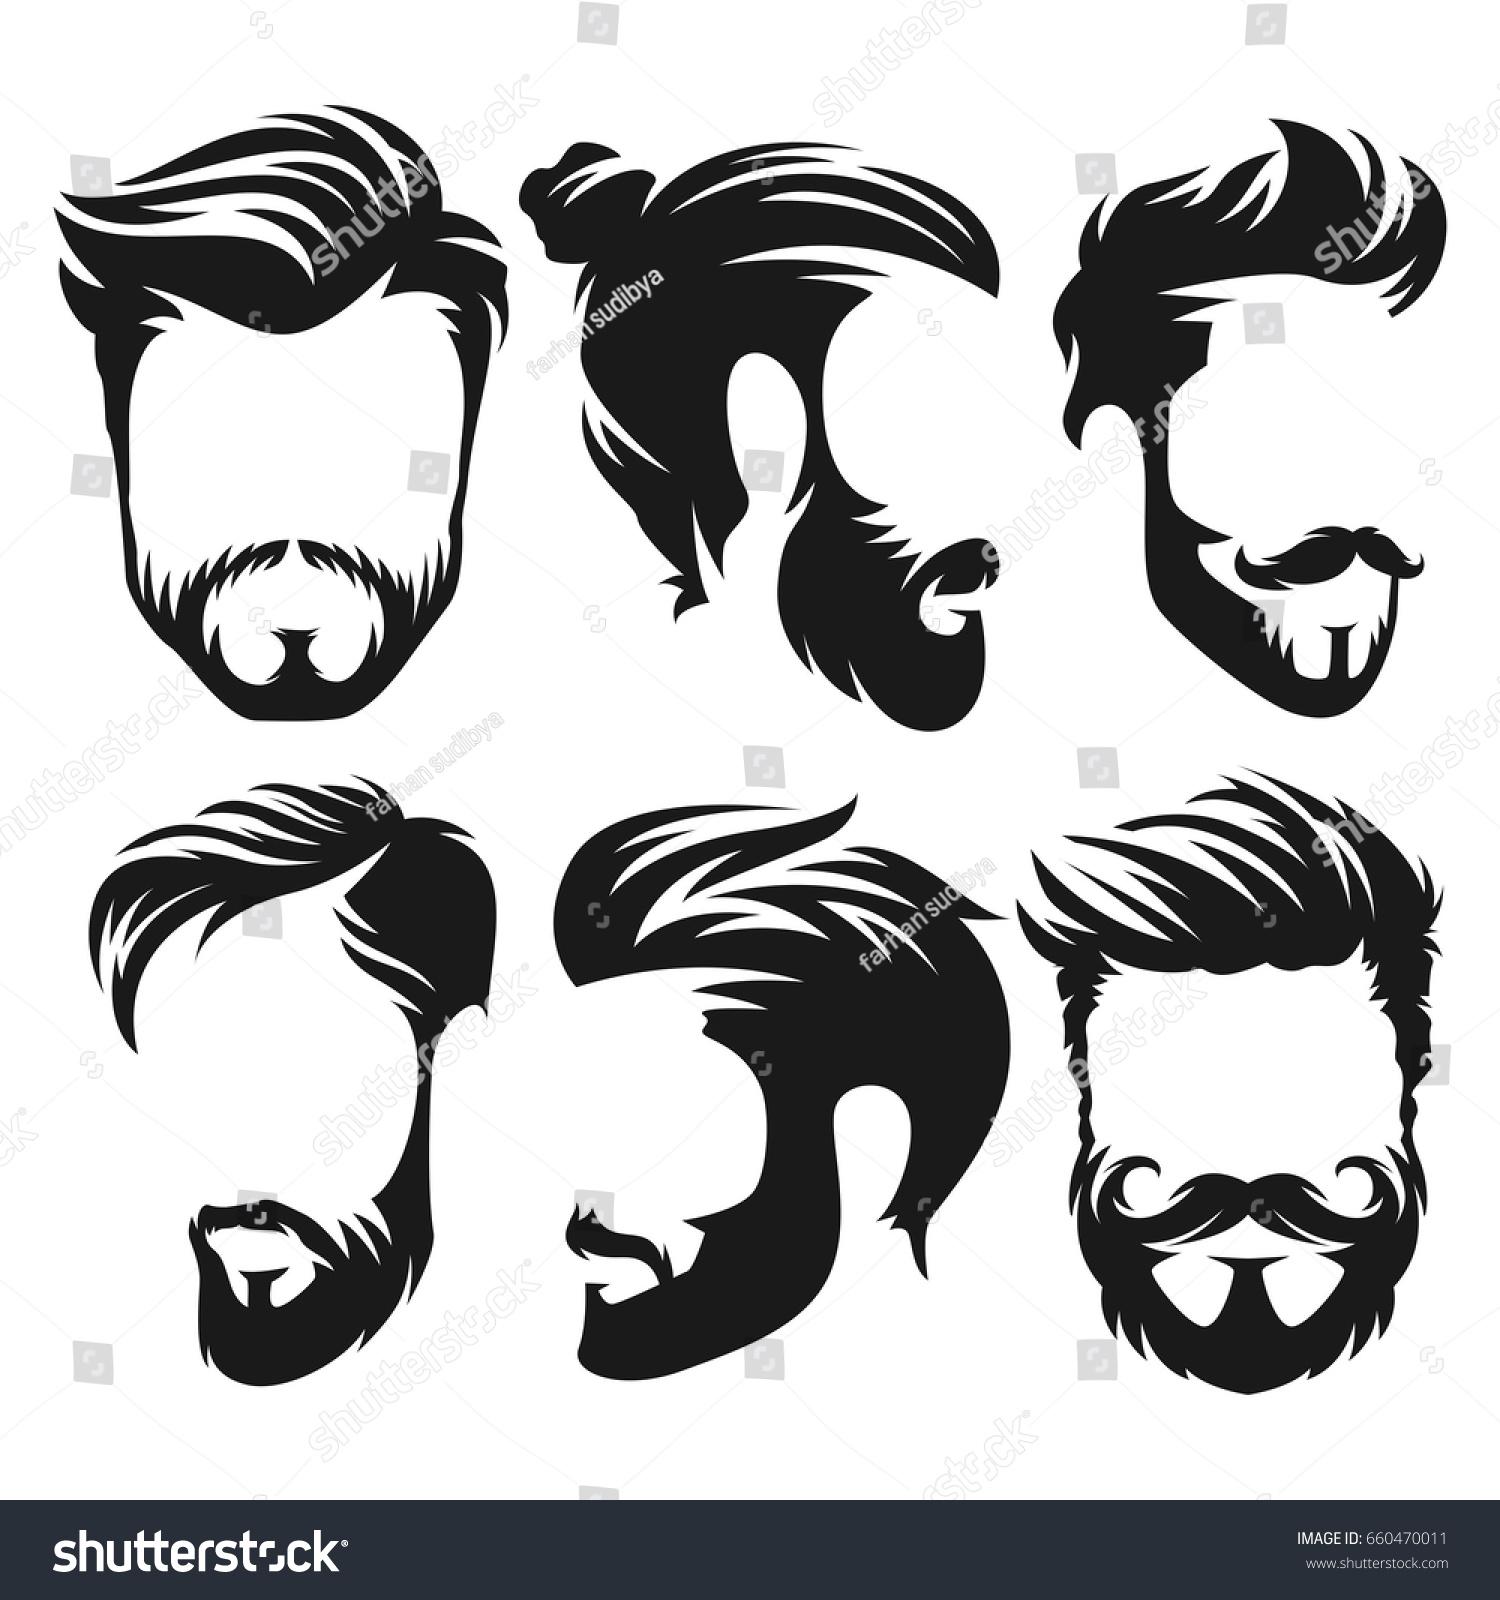 Vector Vintage Hairstyle Barber Shop Logo Stock Vector